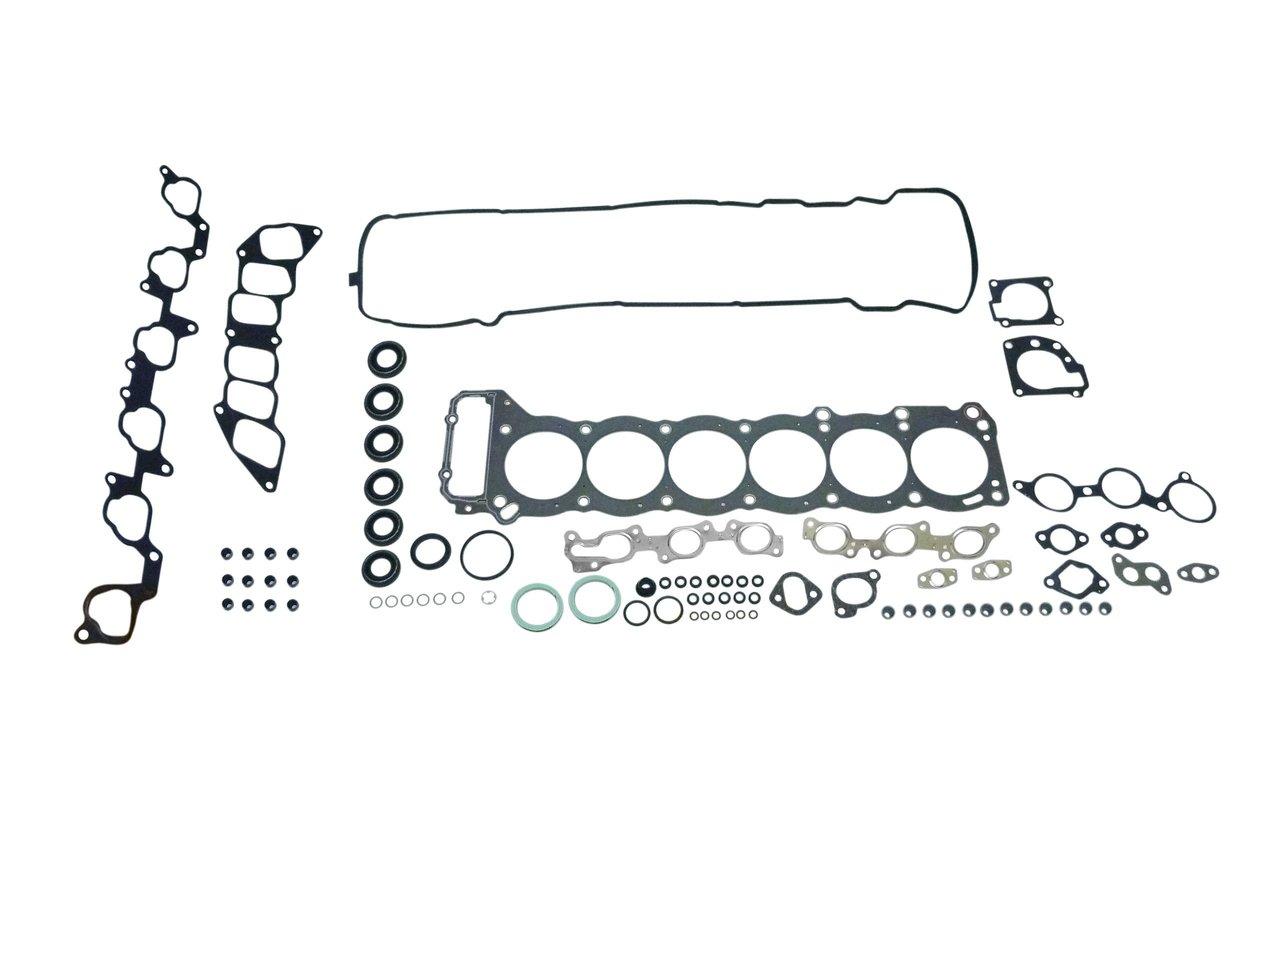 vrs gasket kit suitable for landcruiser 70 75 80 1fzfe petrol